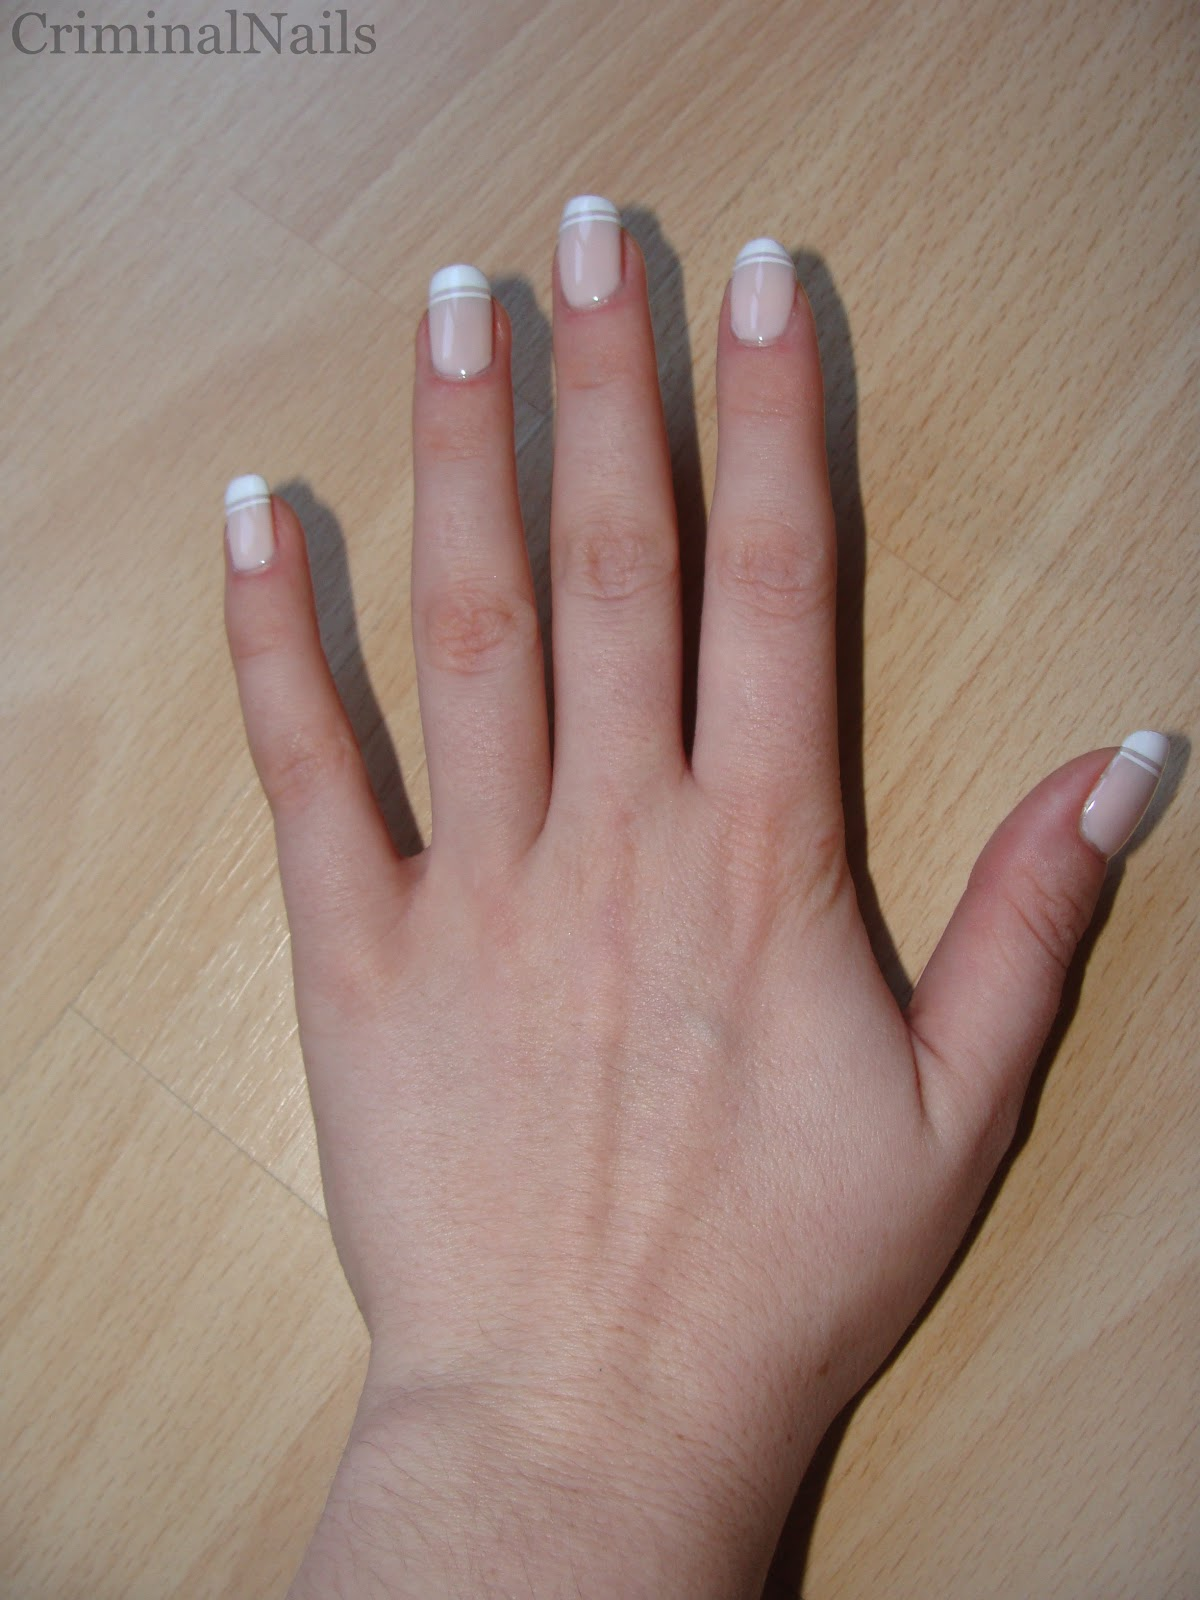 Criminal Nails: Breast Cancer awareness month. Pink manicure nº 5